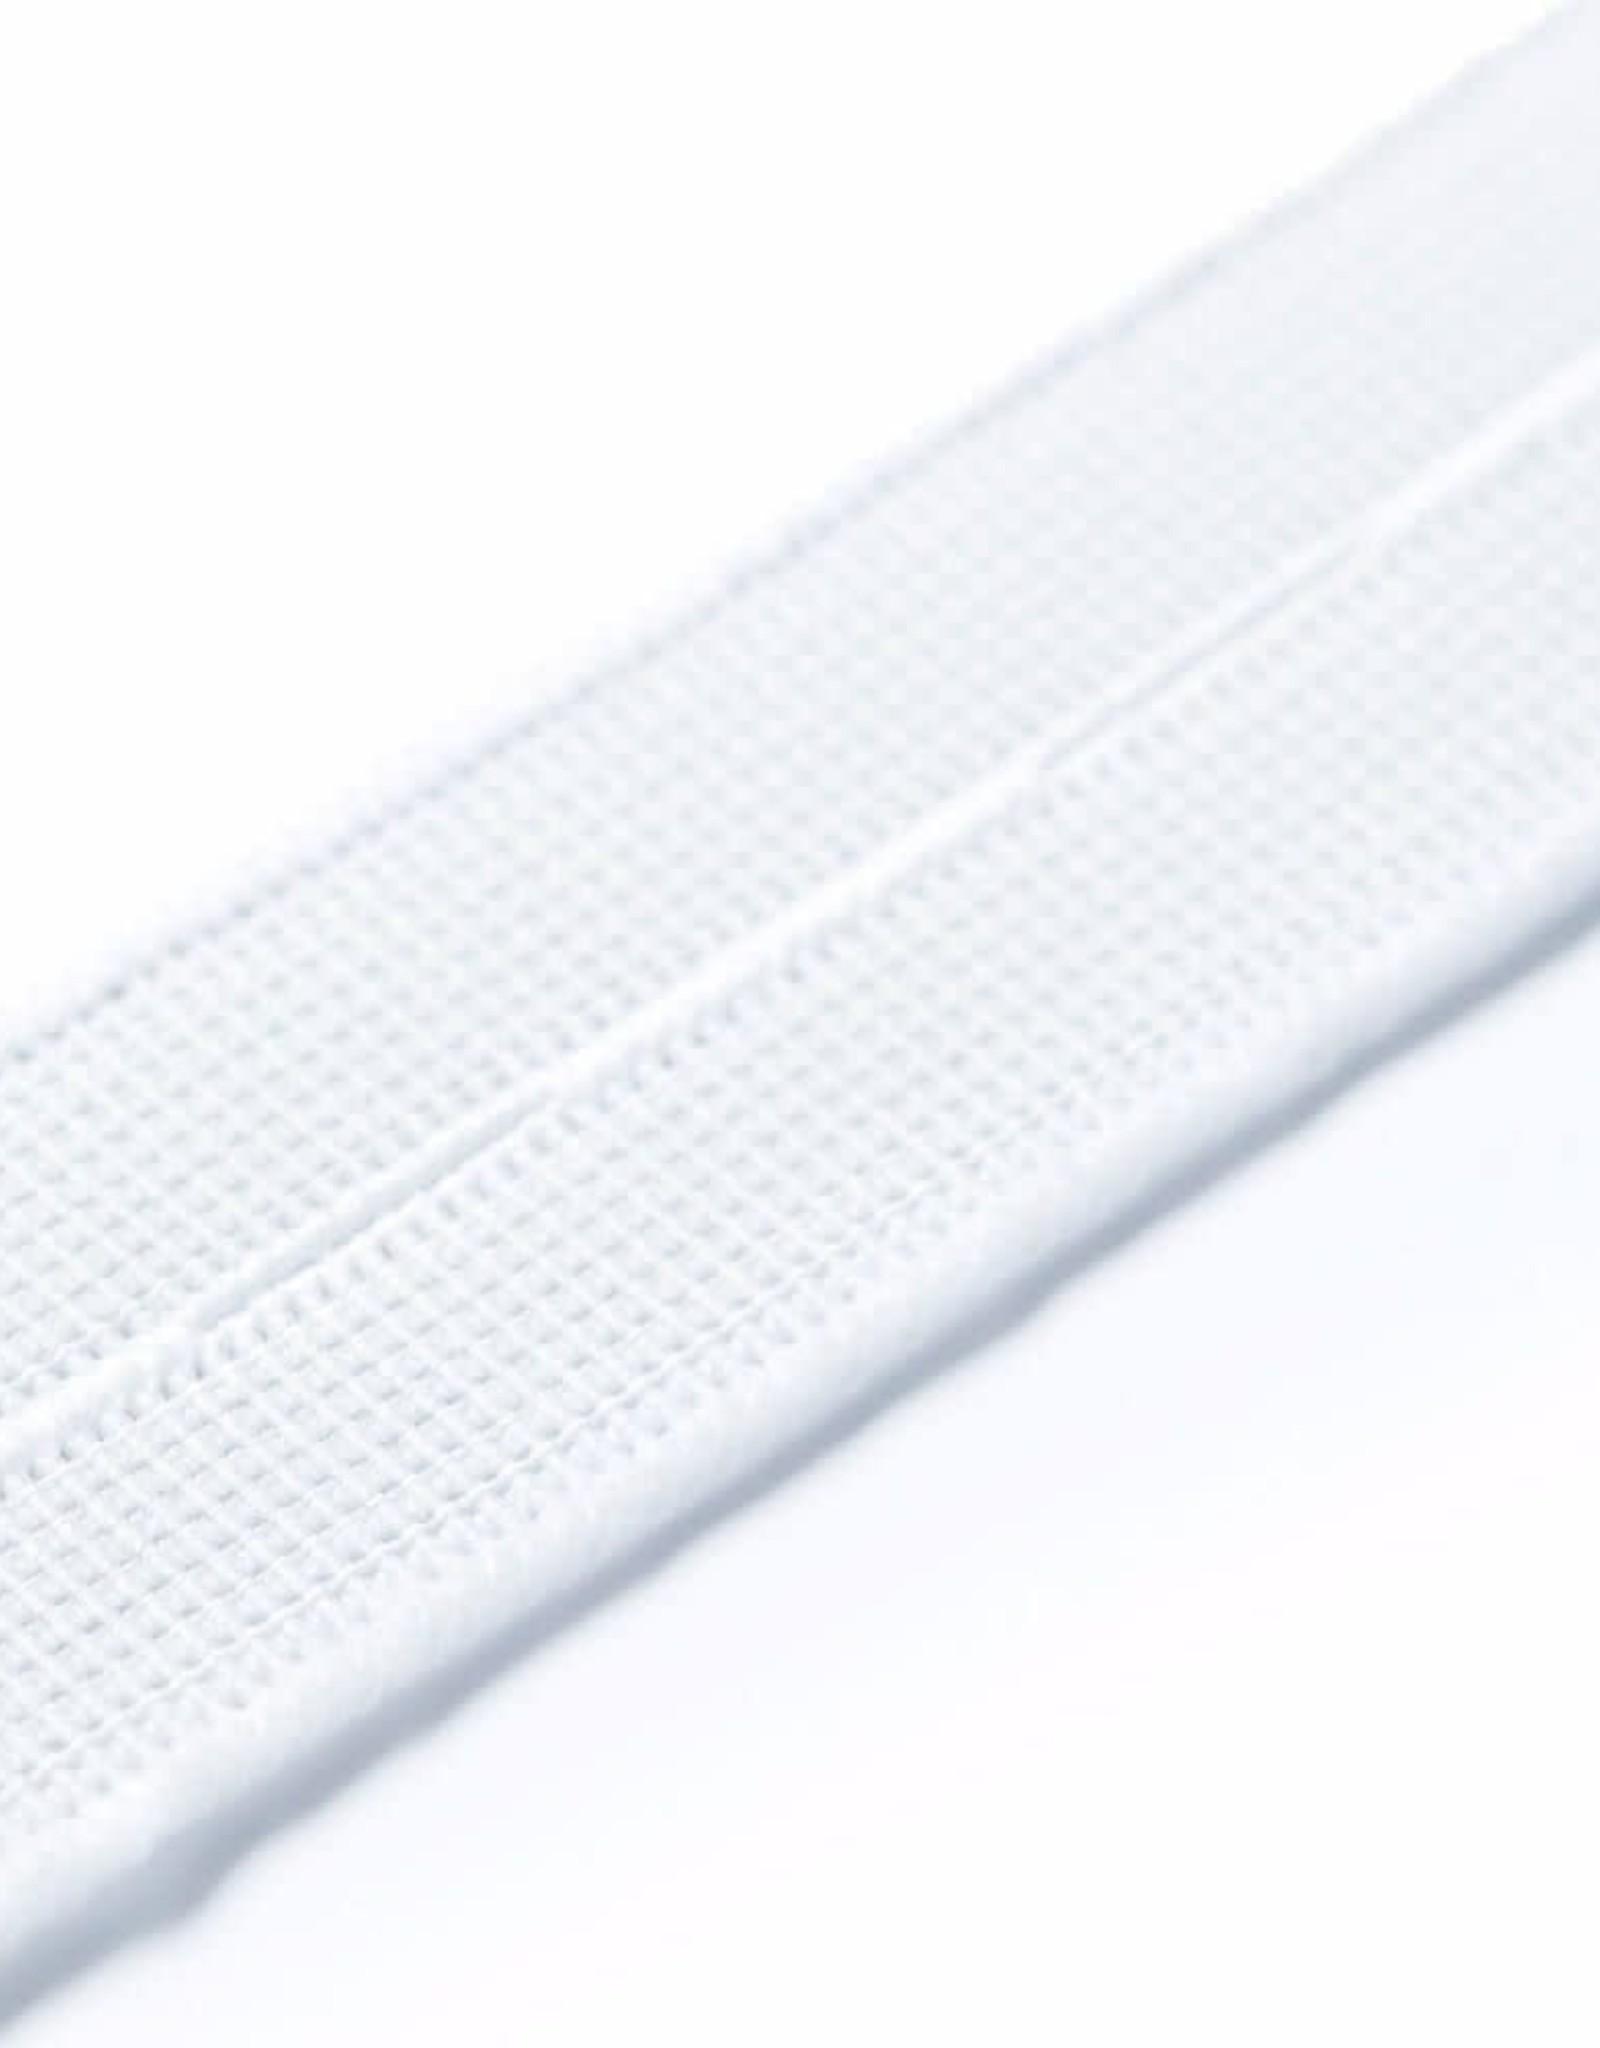 Prym Prym Knoopsgatenelastiek 18 mm wit 1 m op kaartje